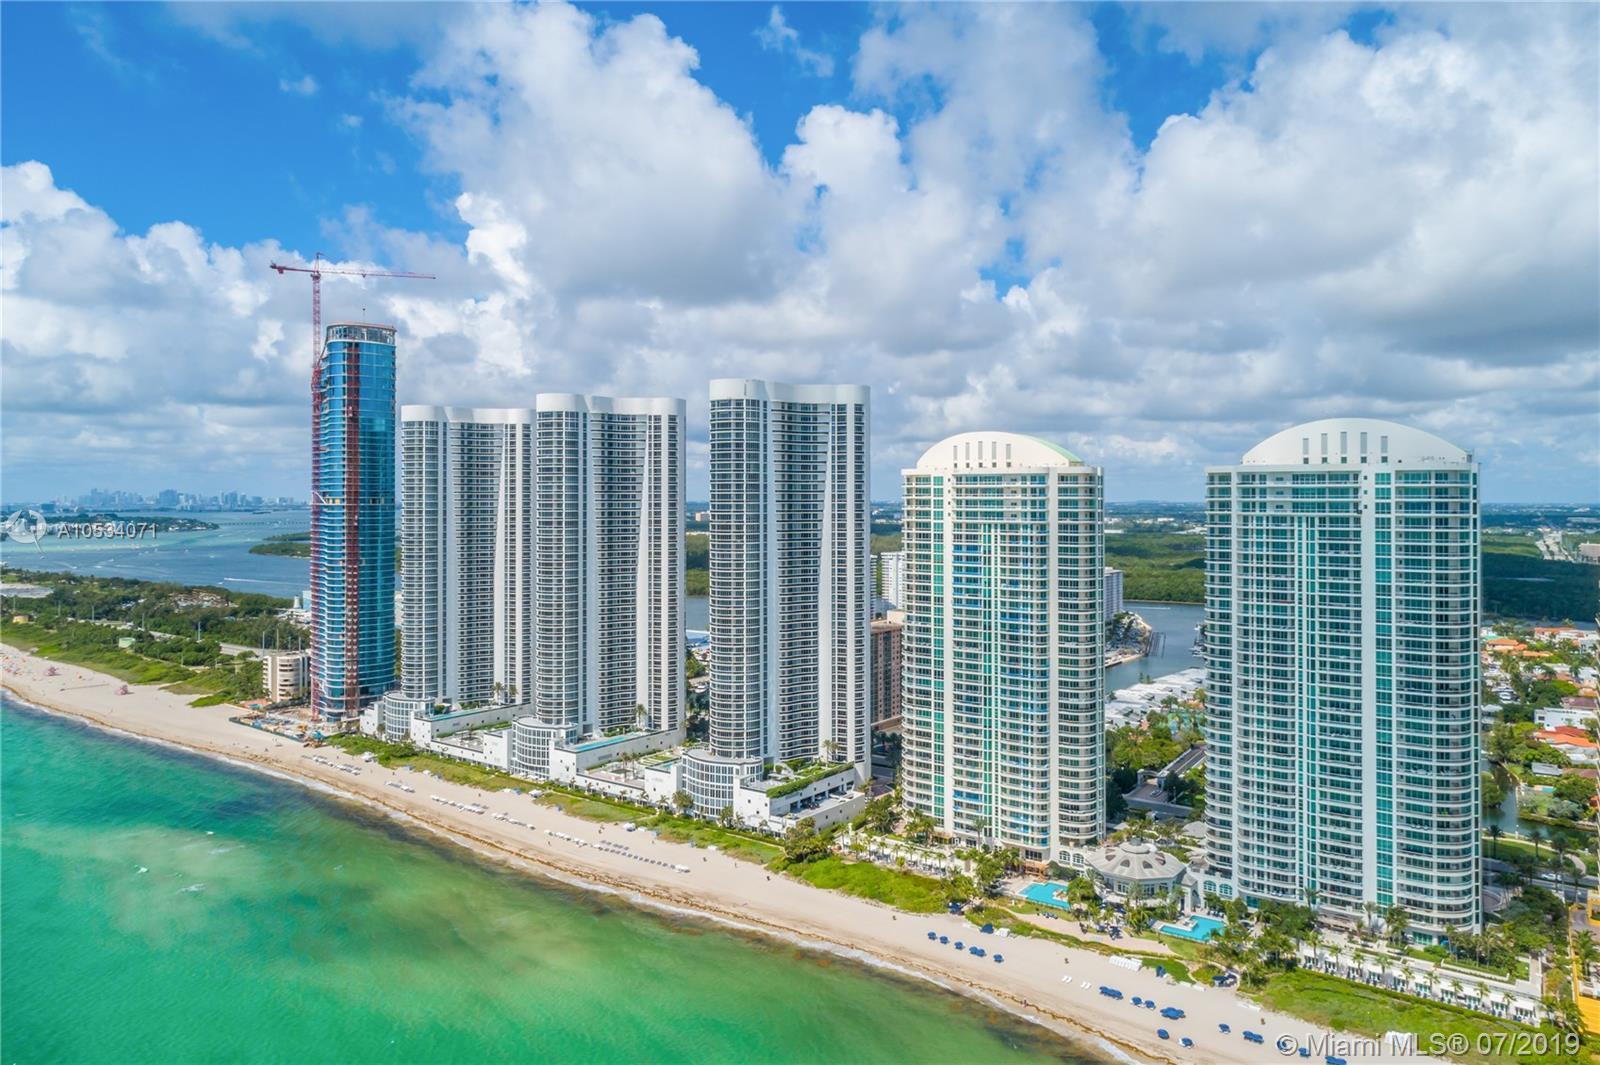 15811 Collins Ave, 1506 - Sunny Isles Beach, Florida